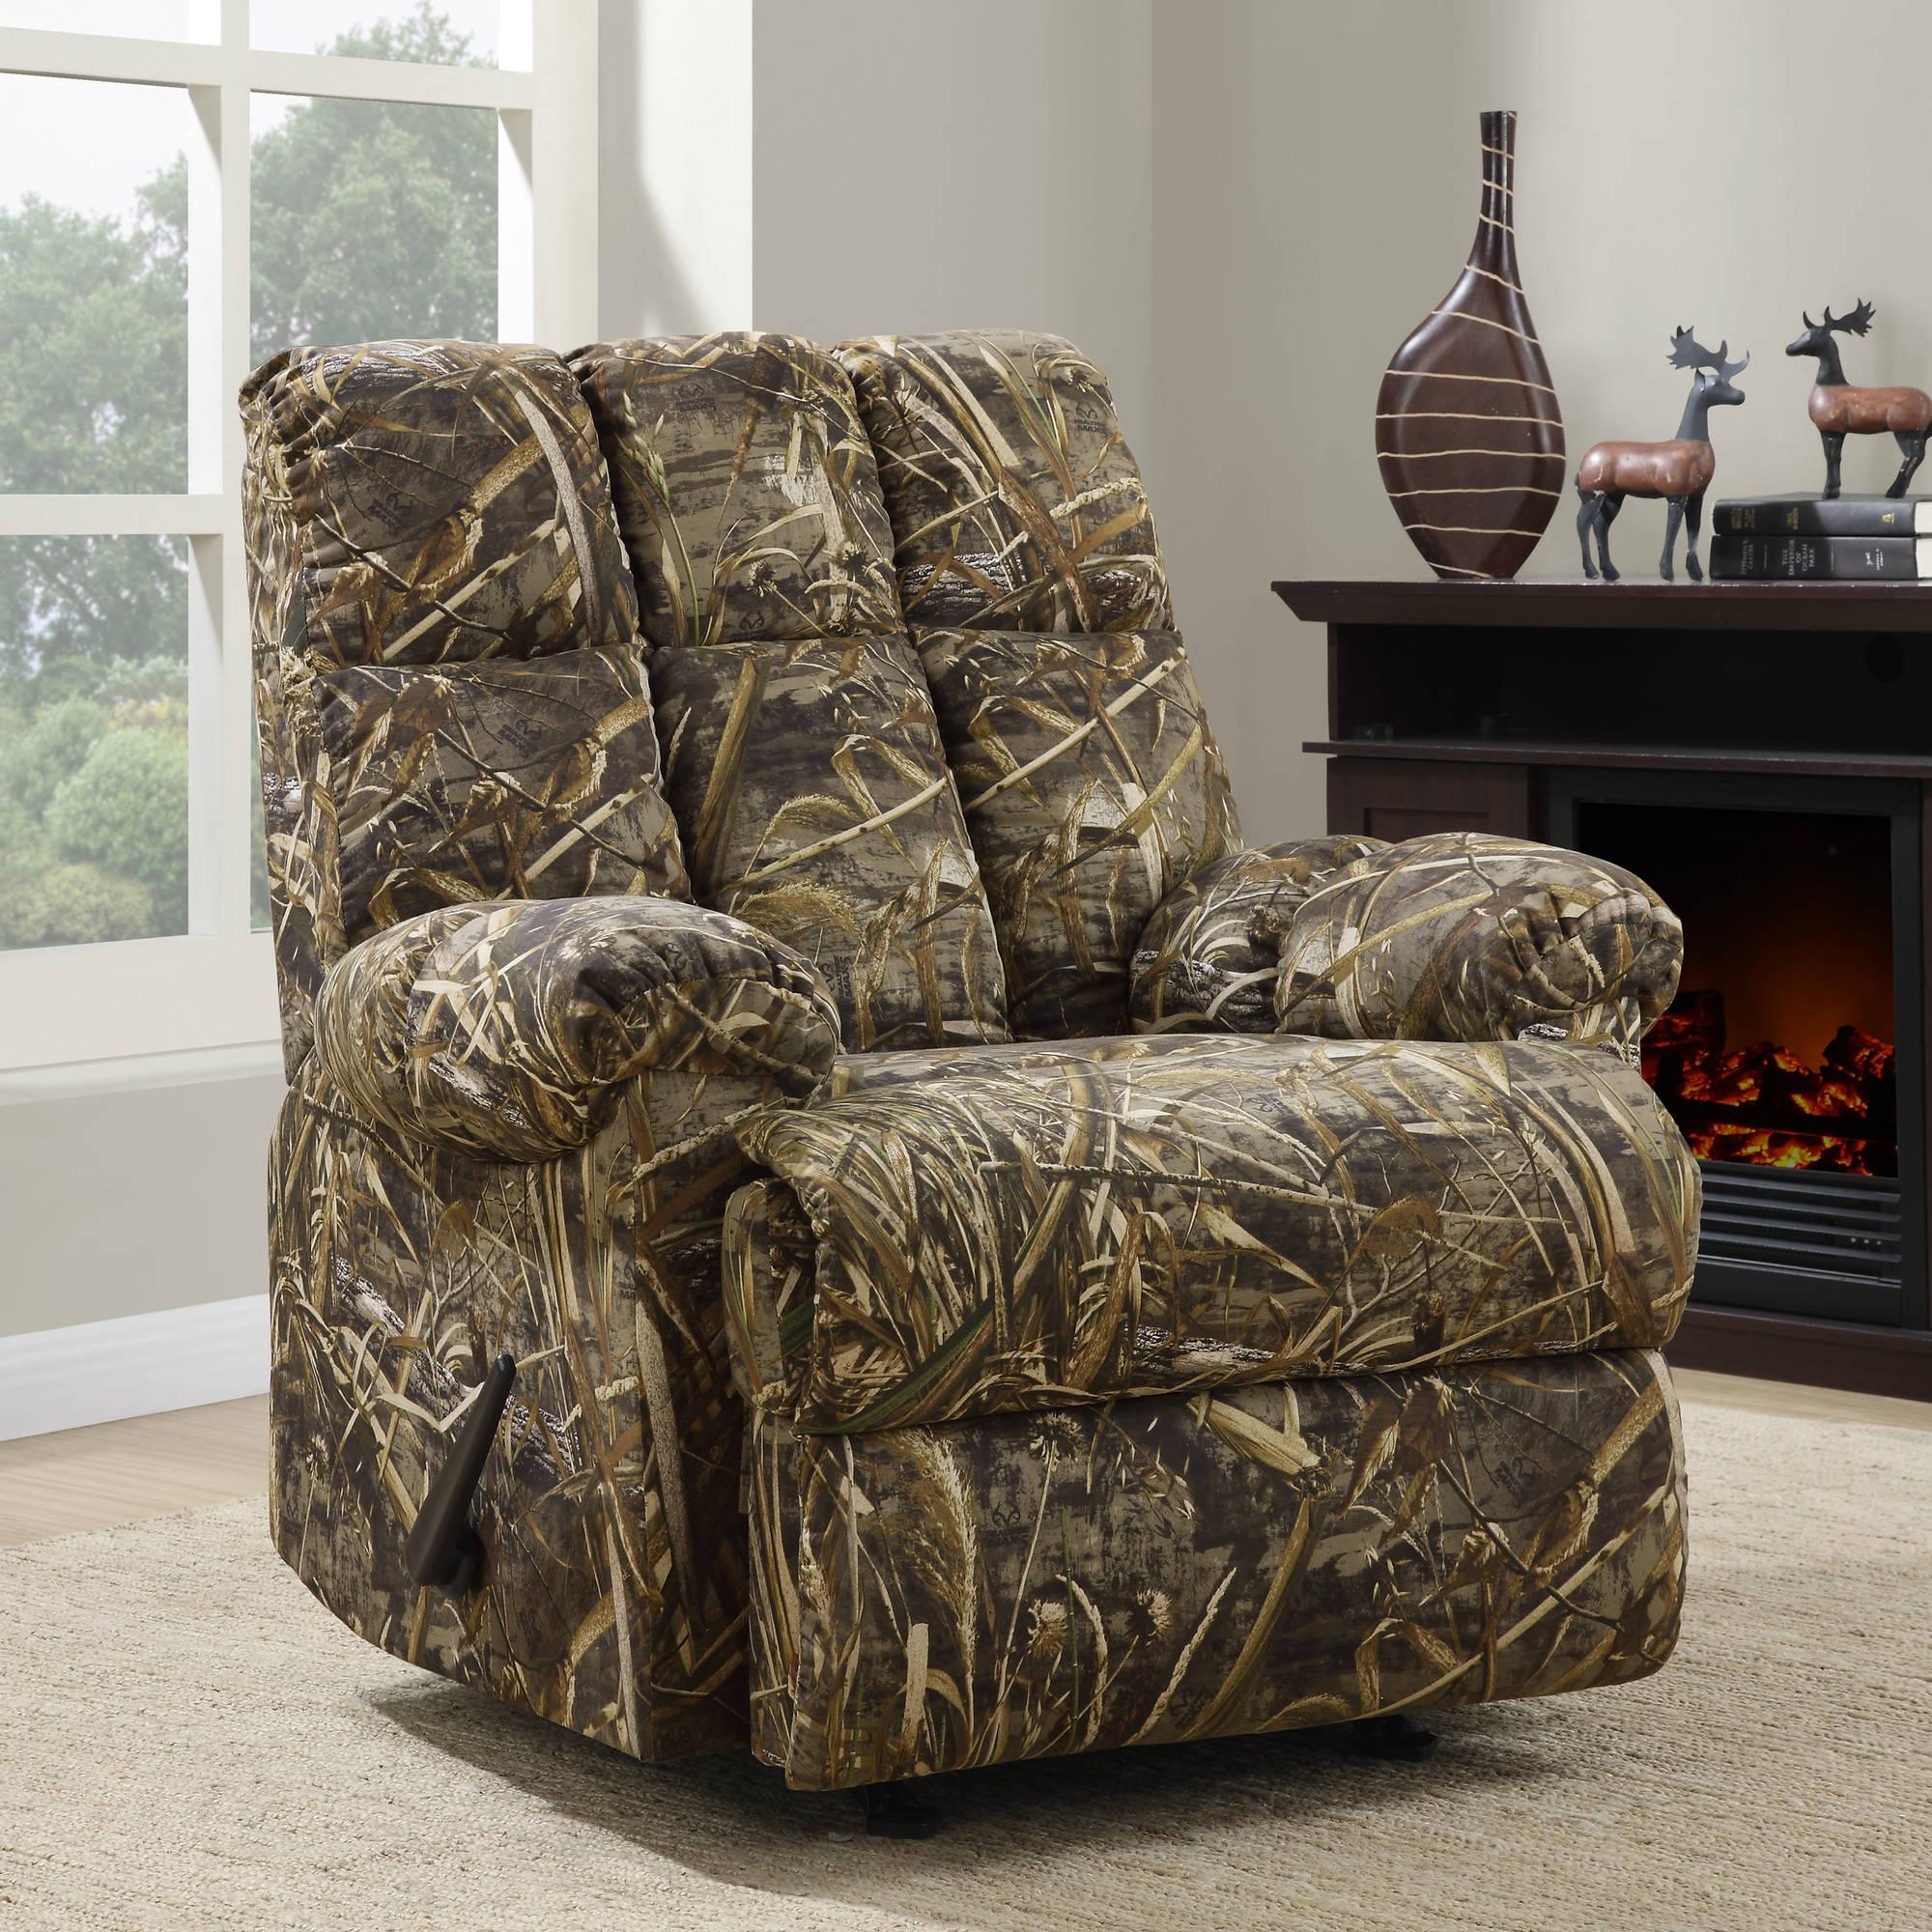 Dorel Home Realtree Camouflage Rocker Recliner - Walmart.com